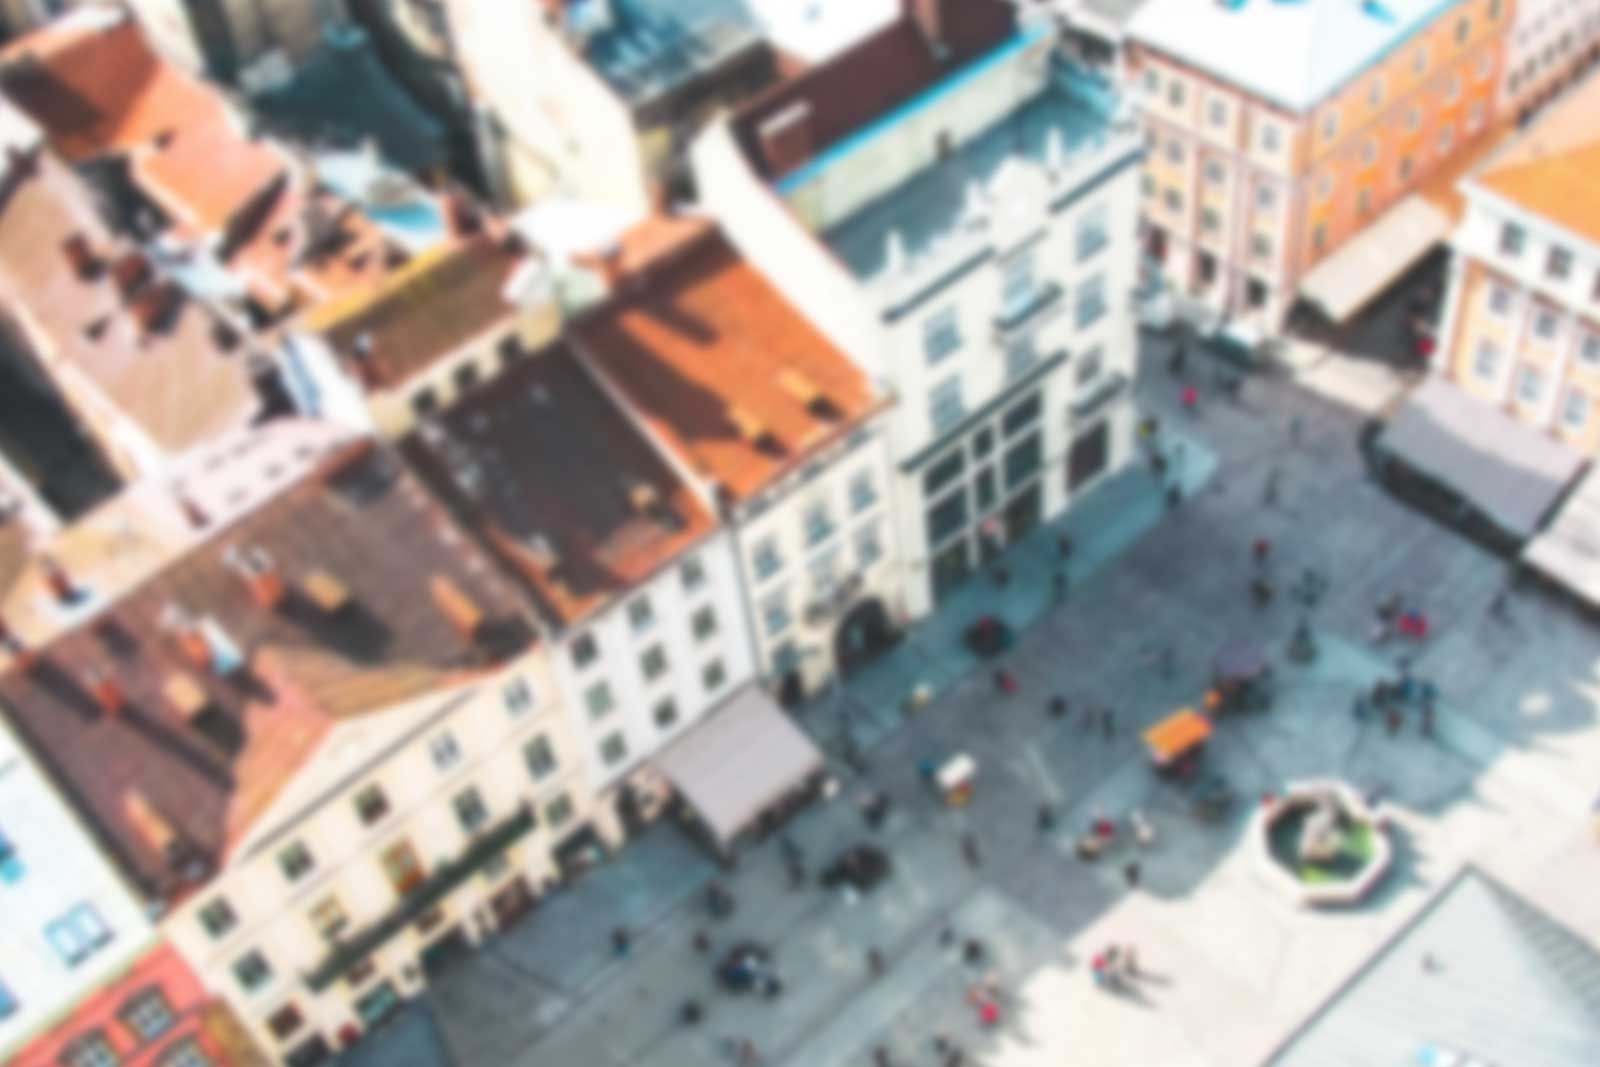 Markt am Alaunplatz